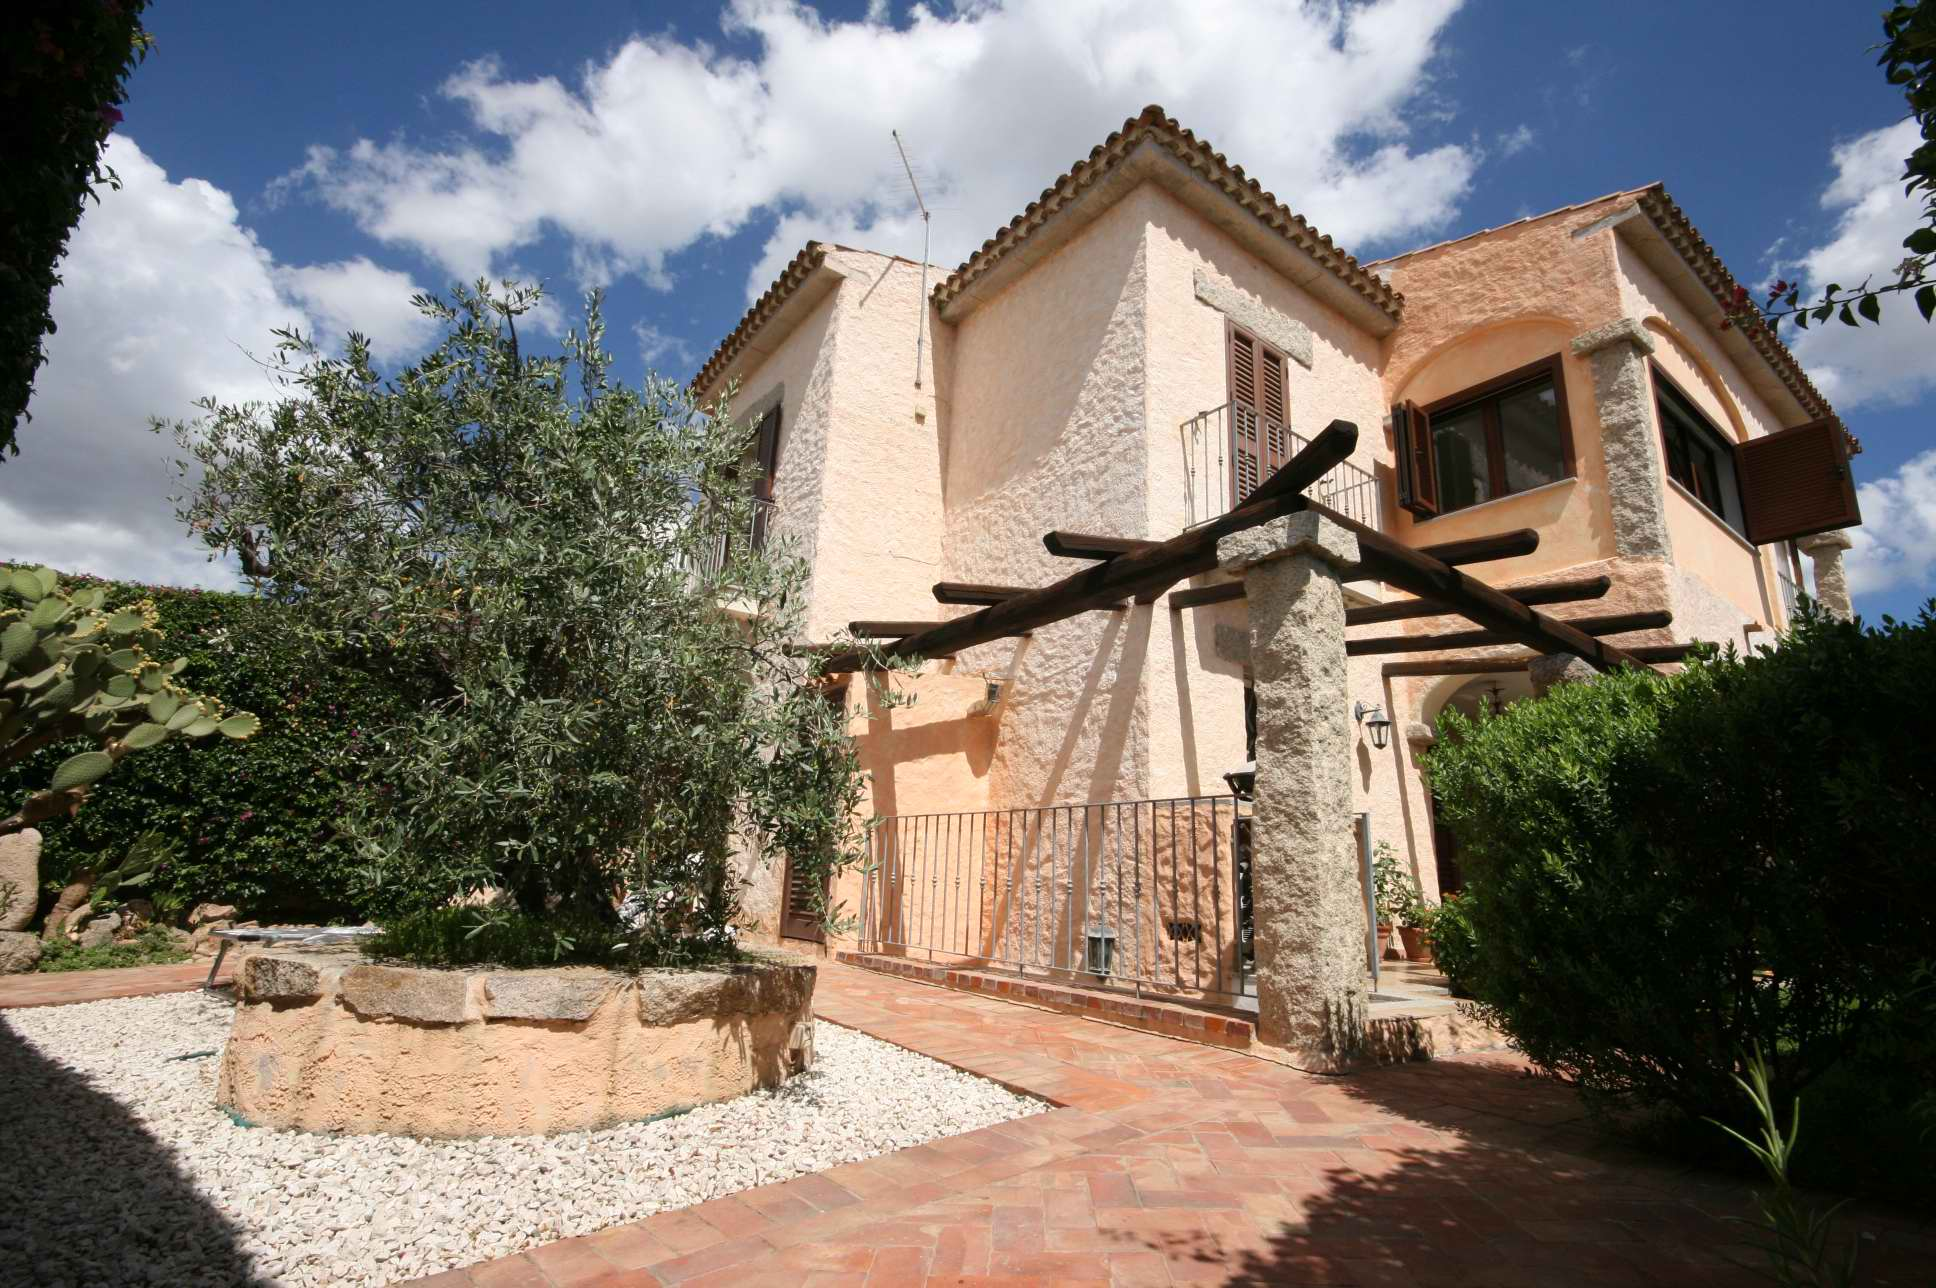 Villa semi detached in Arzachena Sardinia